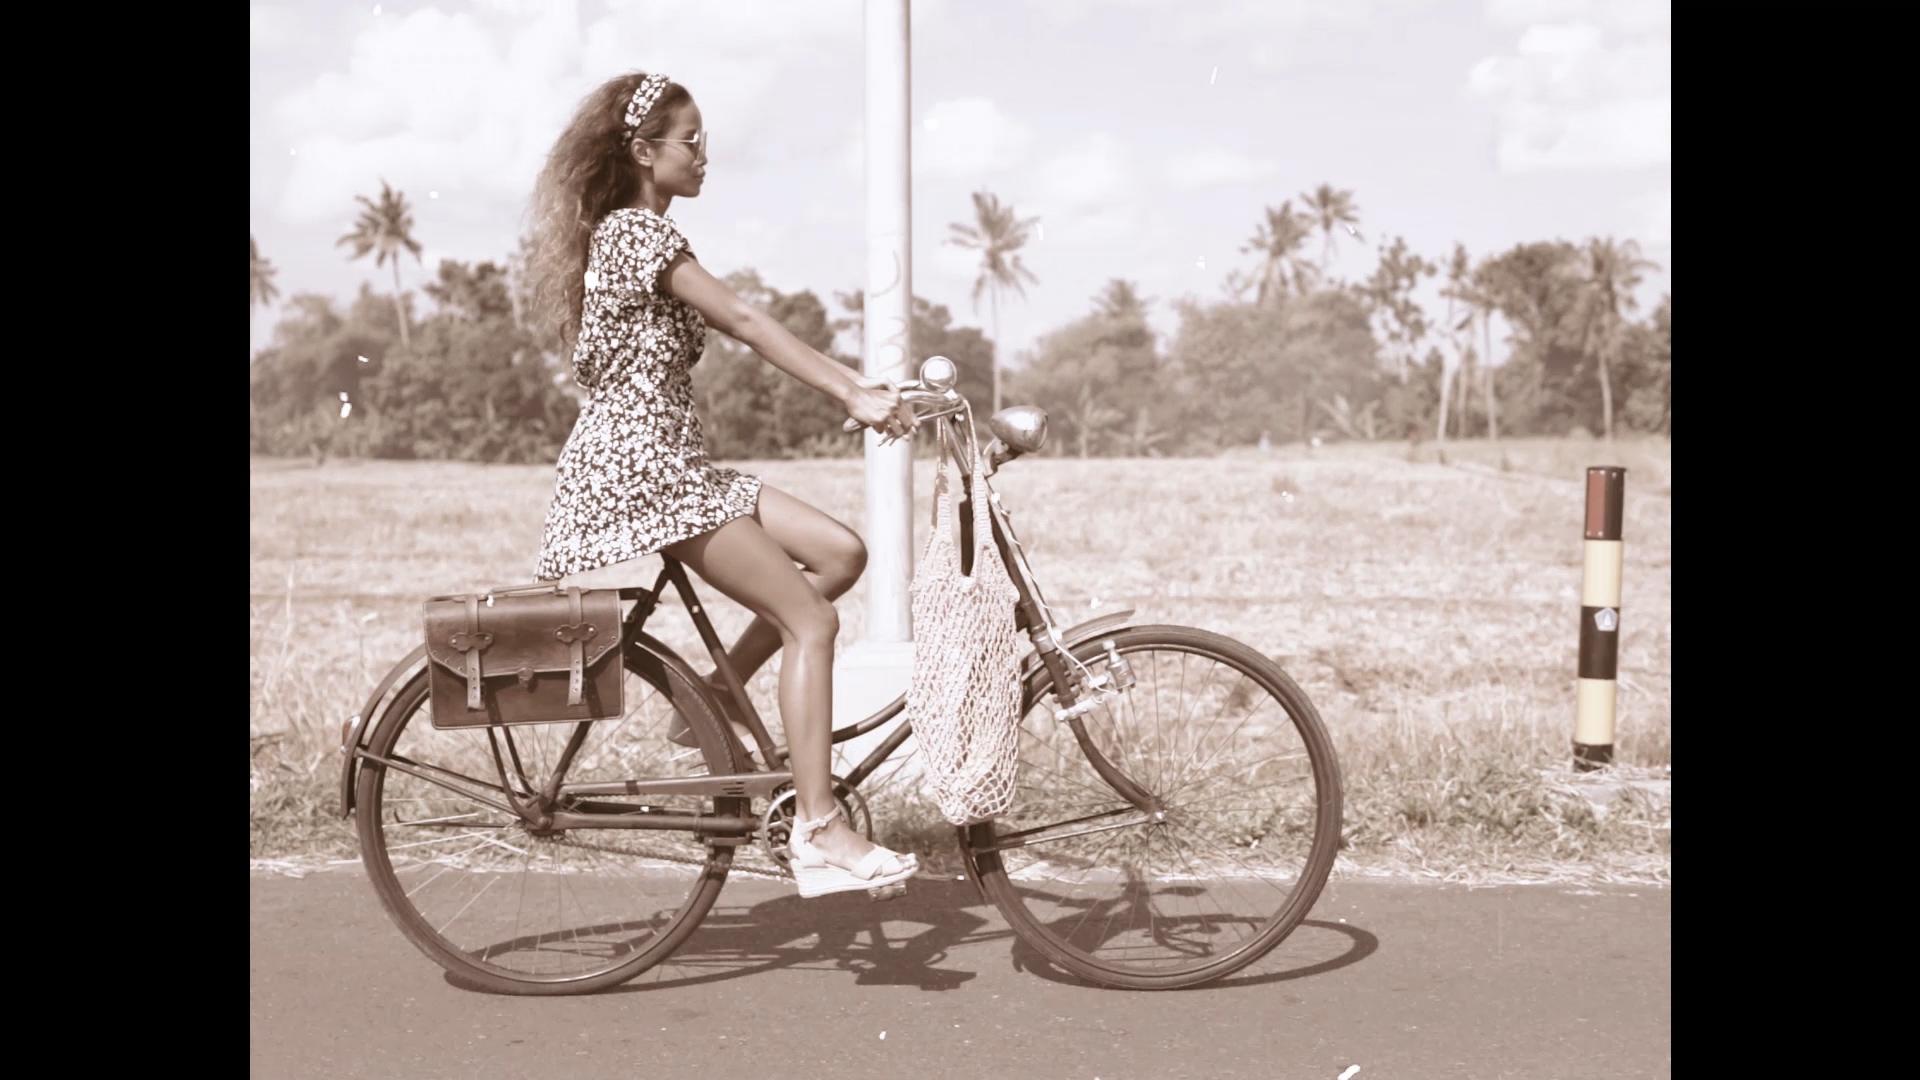 024-cyclingcommando-Putri-Cinta-teaser-stills-6.jpg